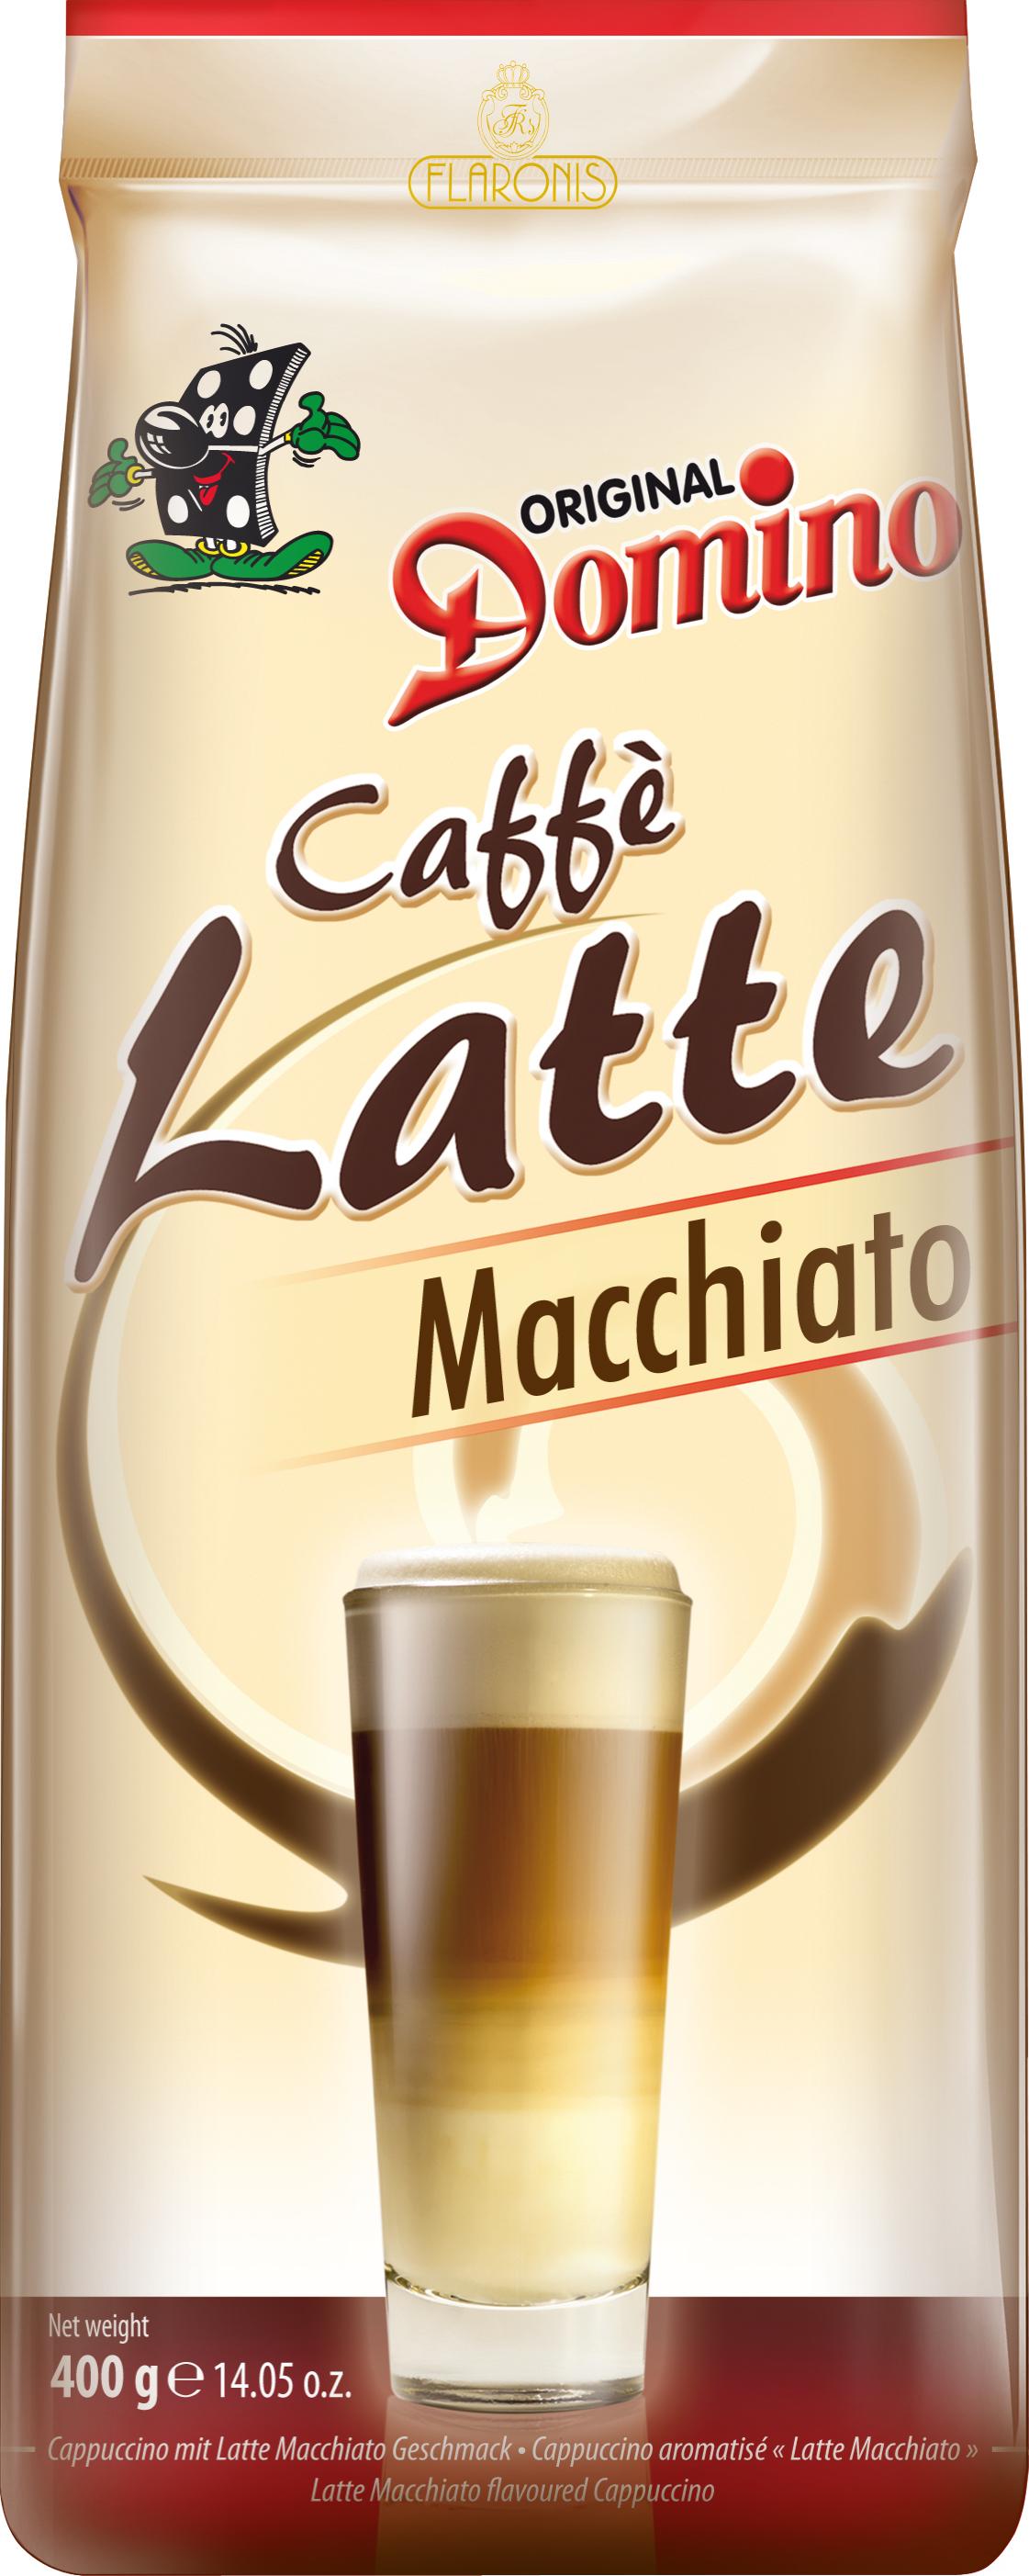 905 - Domino Latte Macchiato 400g.jpg